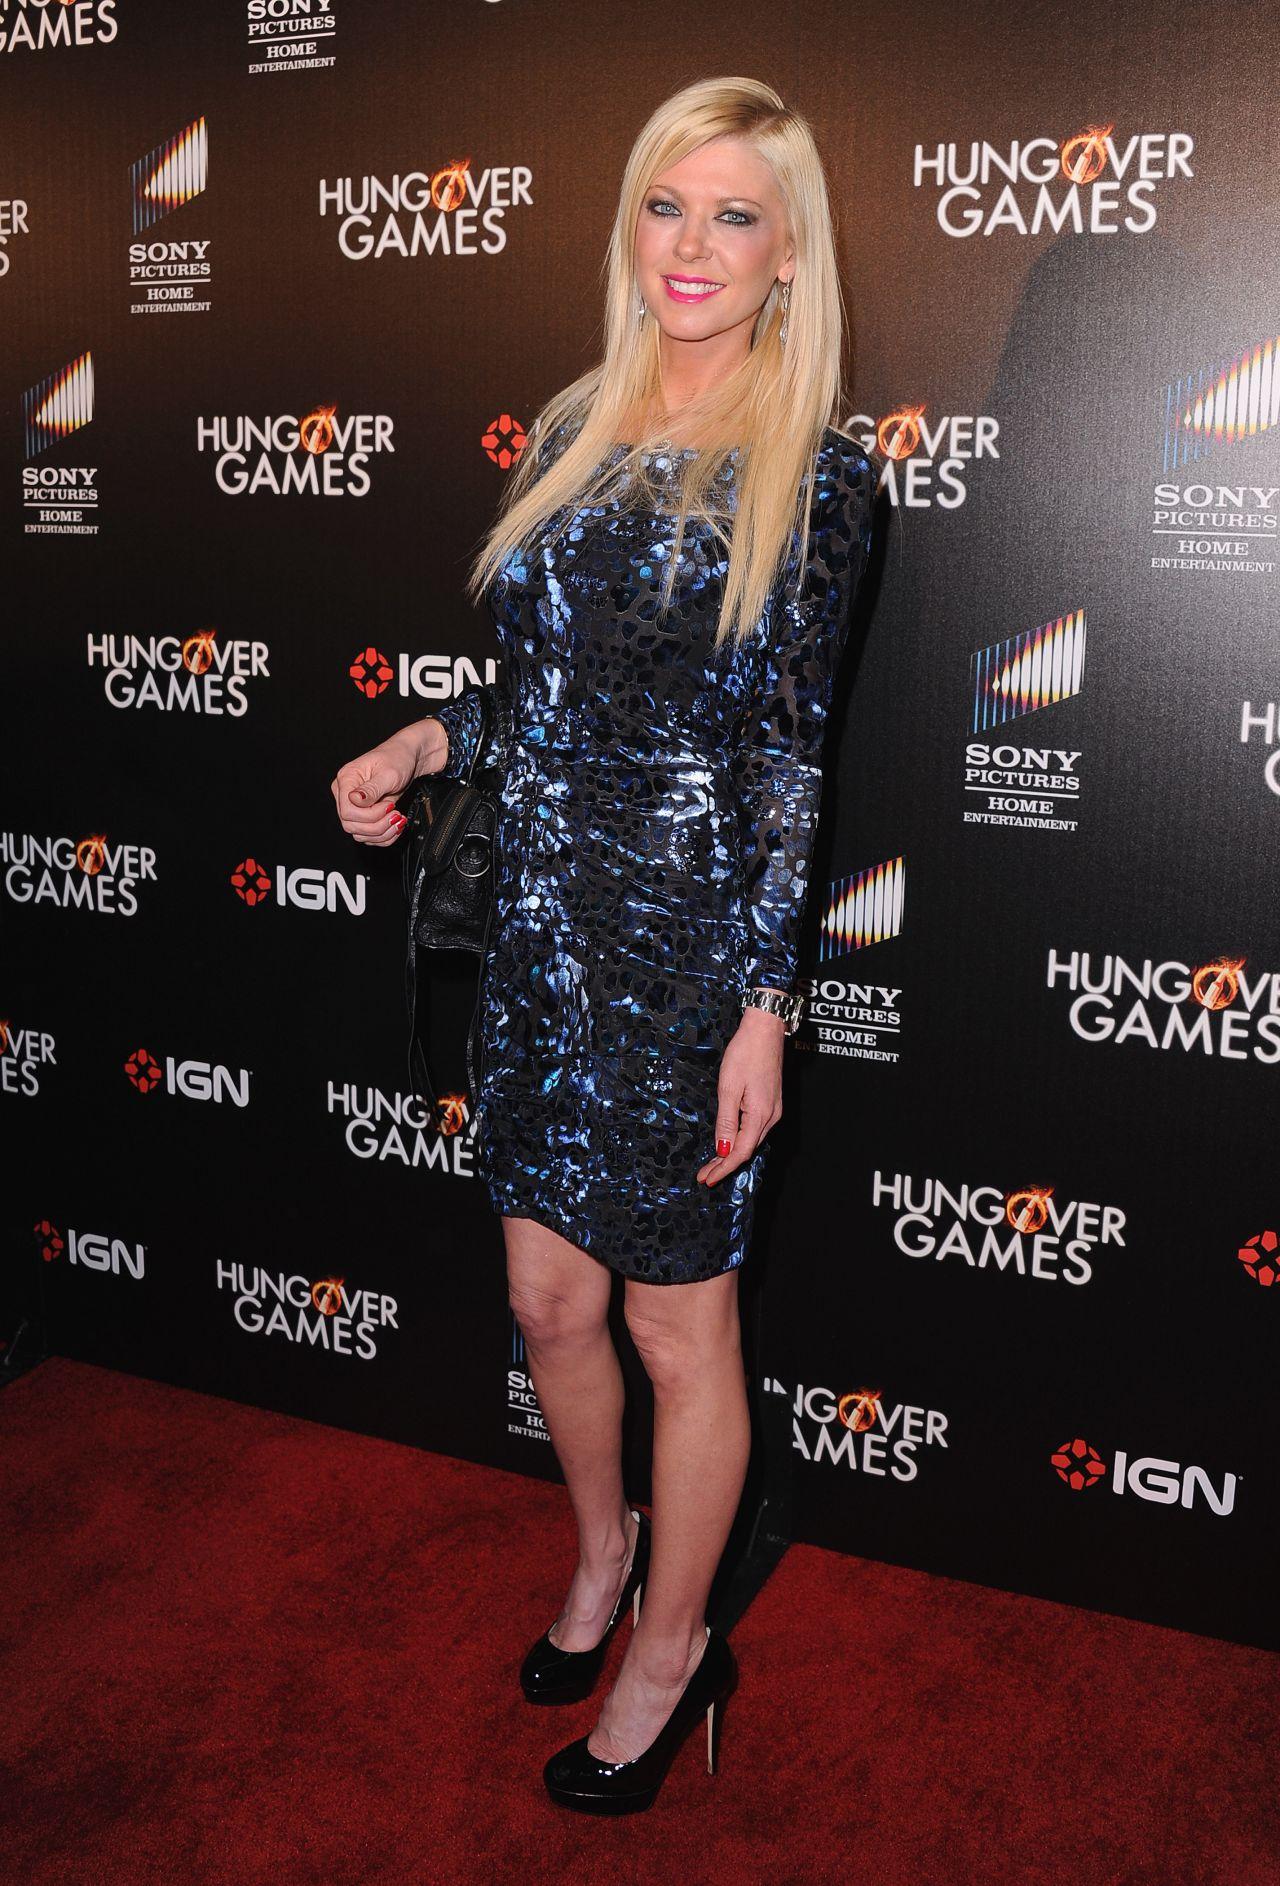 Tara Reid Red Carpet Photos Hungover Games Premiere Feb